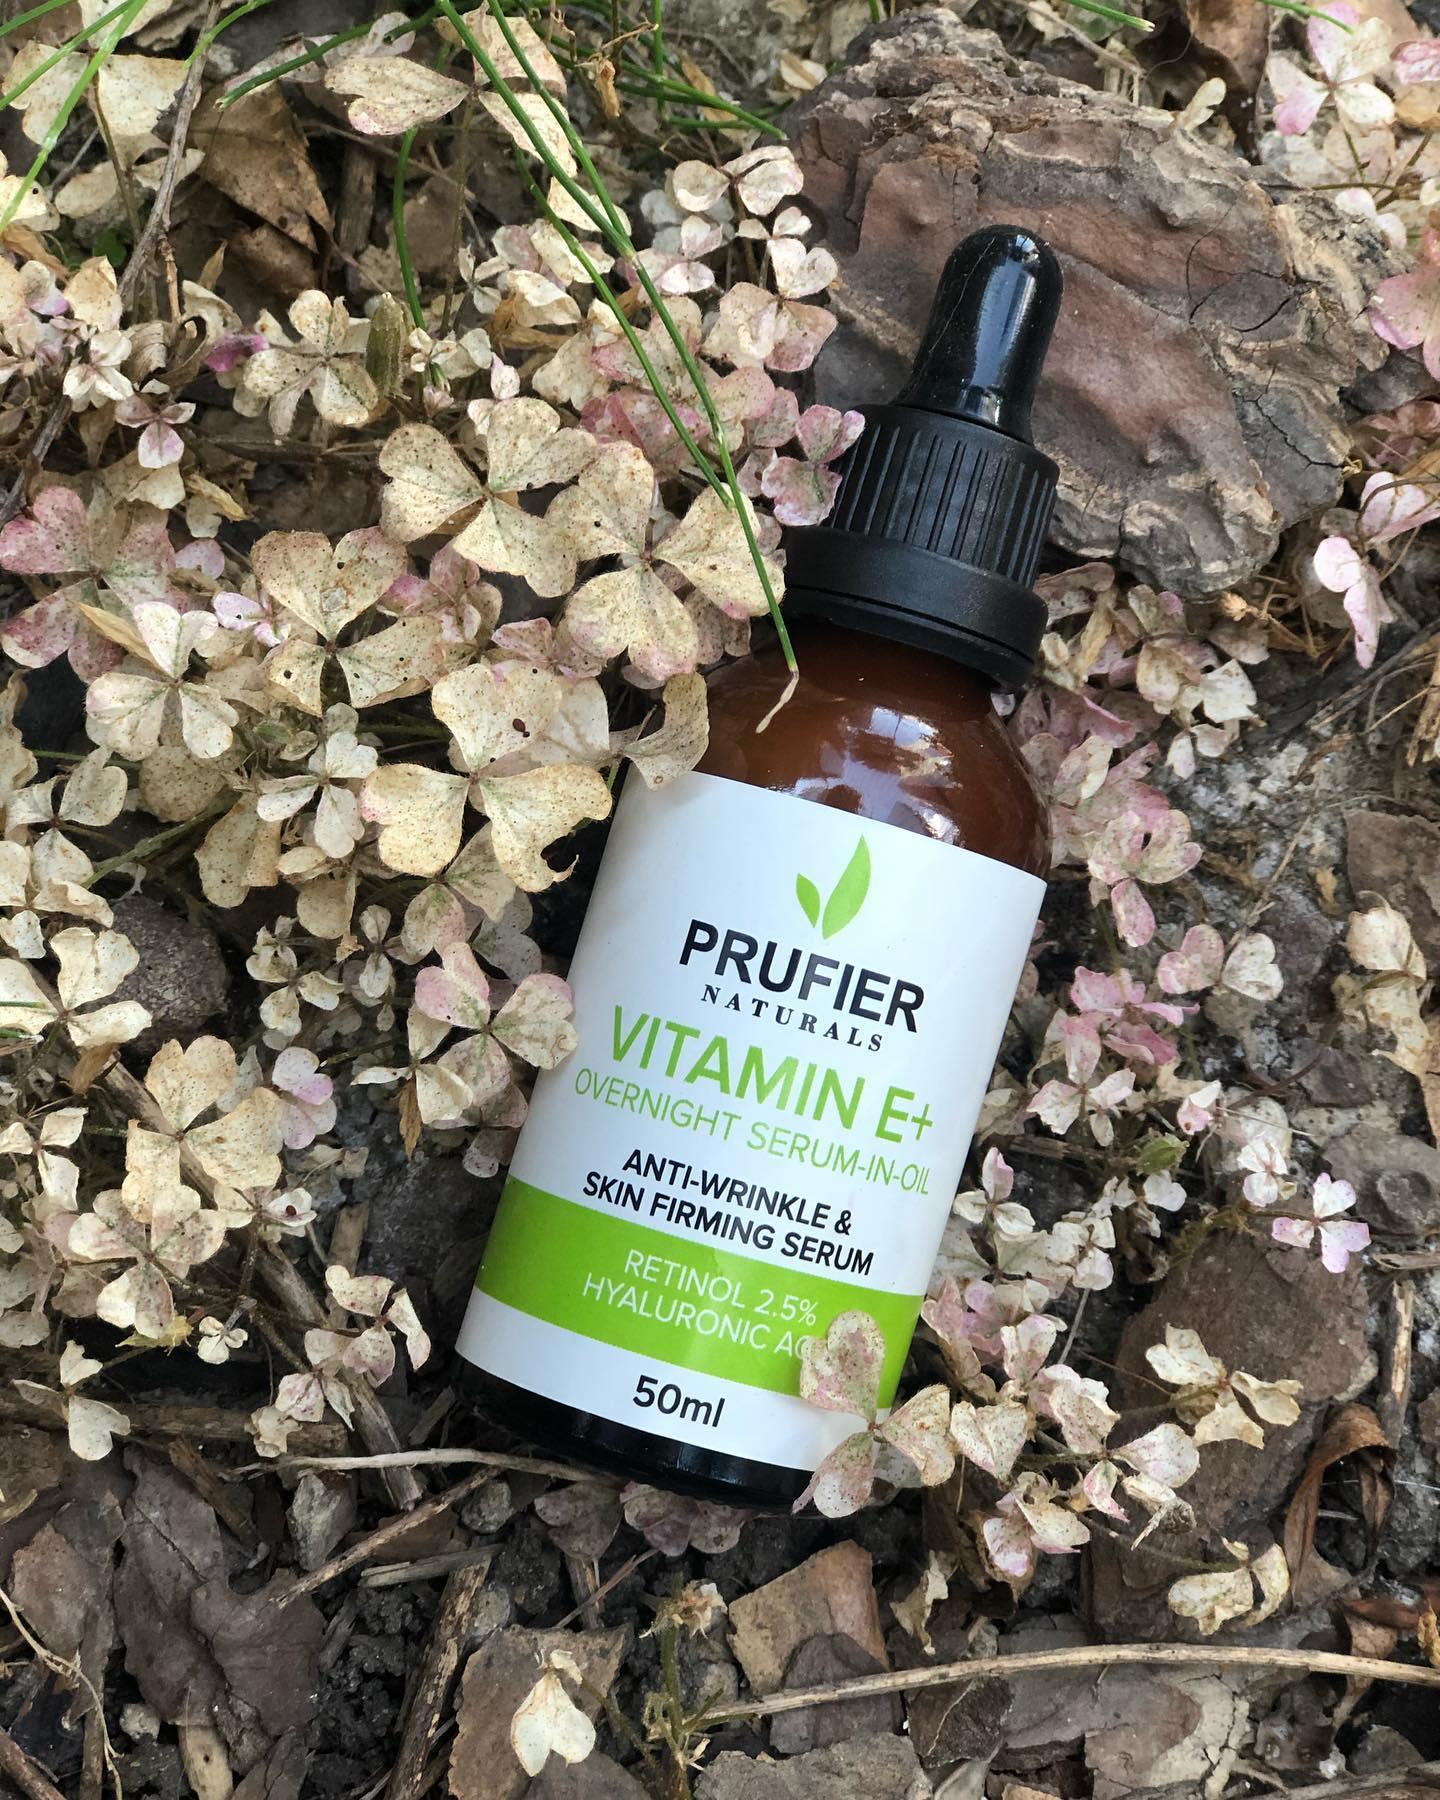 Prufier Naturals Anti-Wrinkle Skin Firming Serum